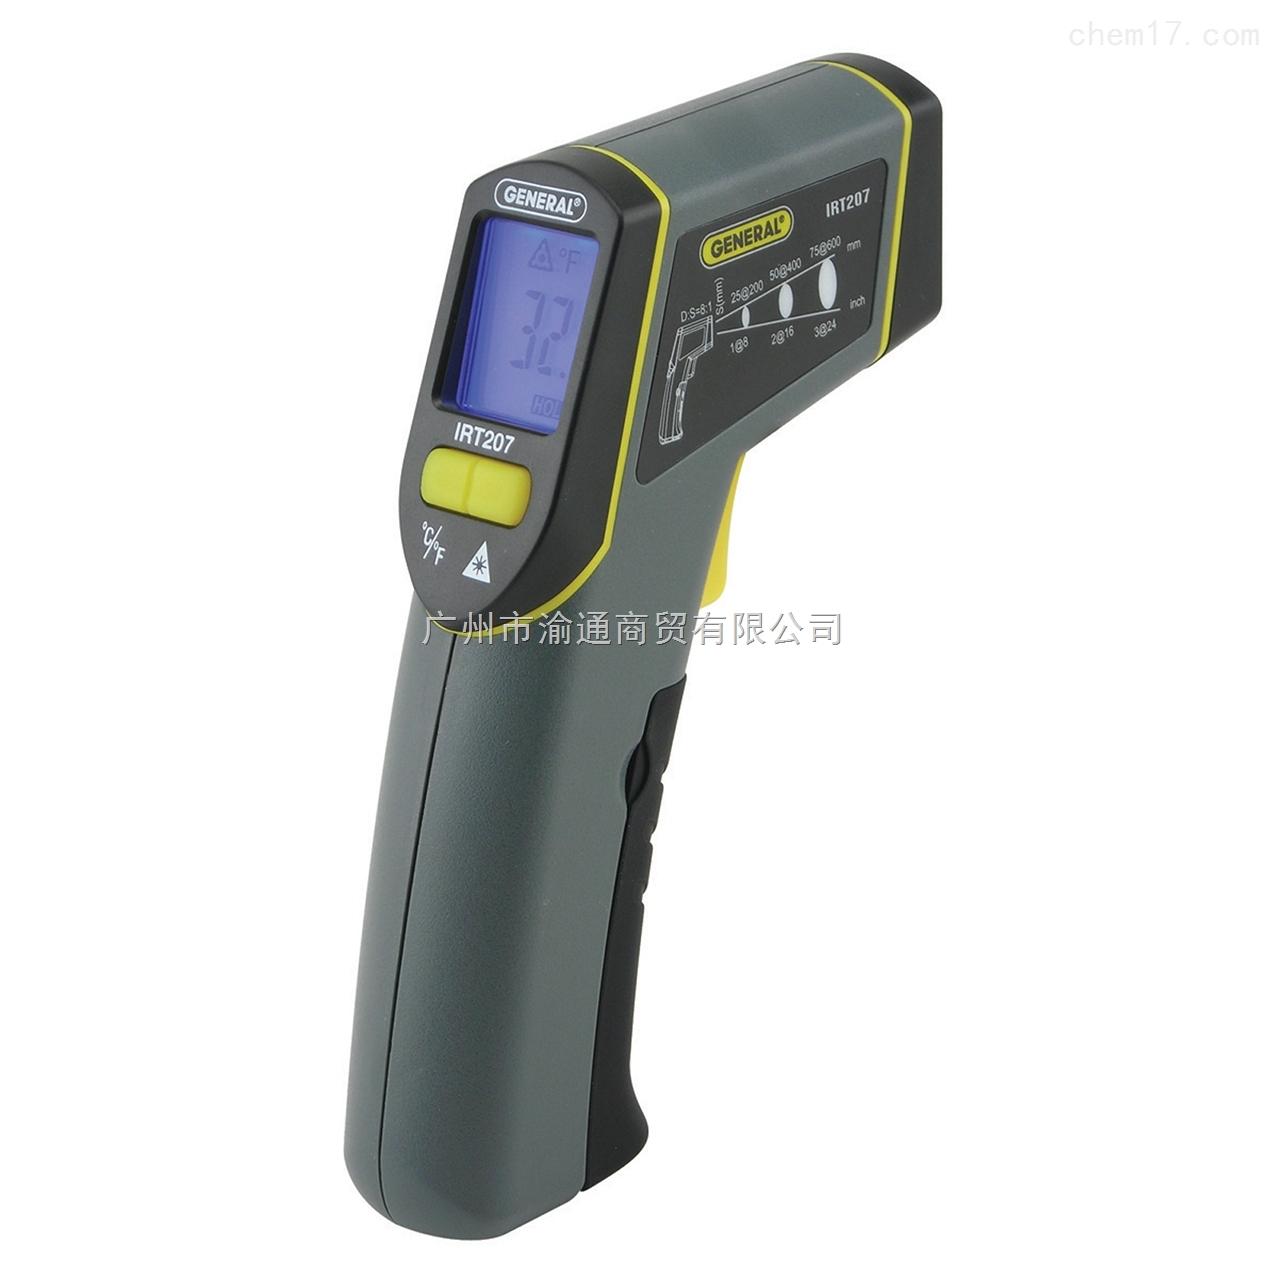 General IRT207迷你型红外测温仪